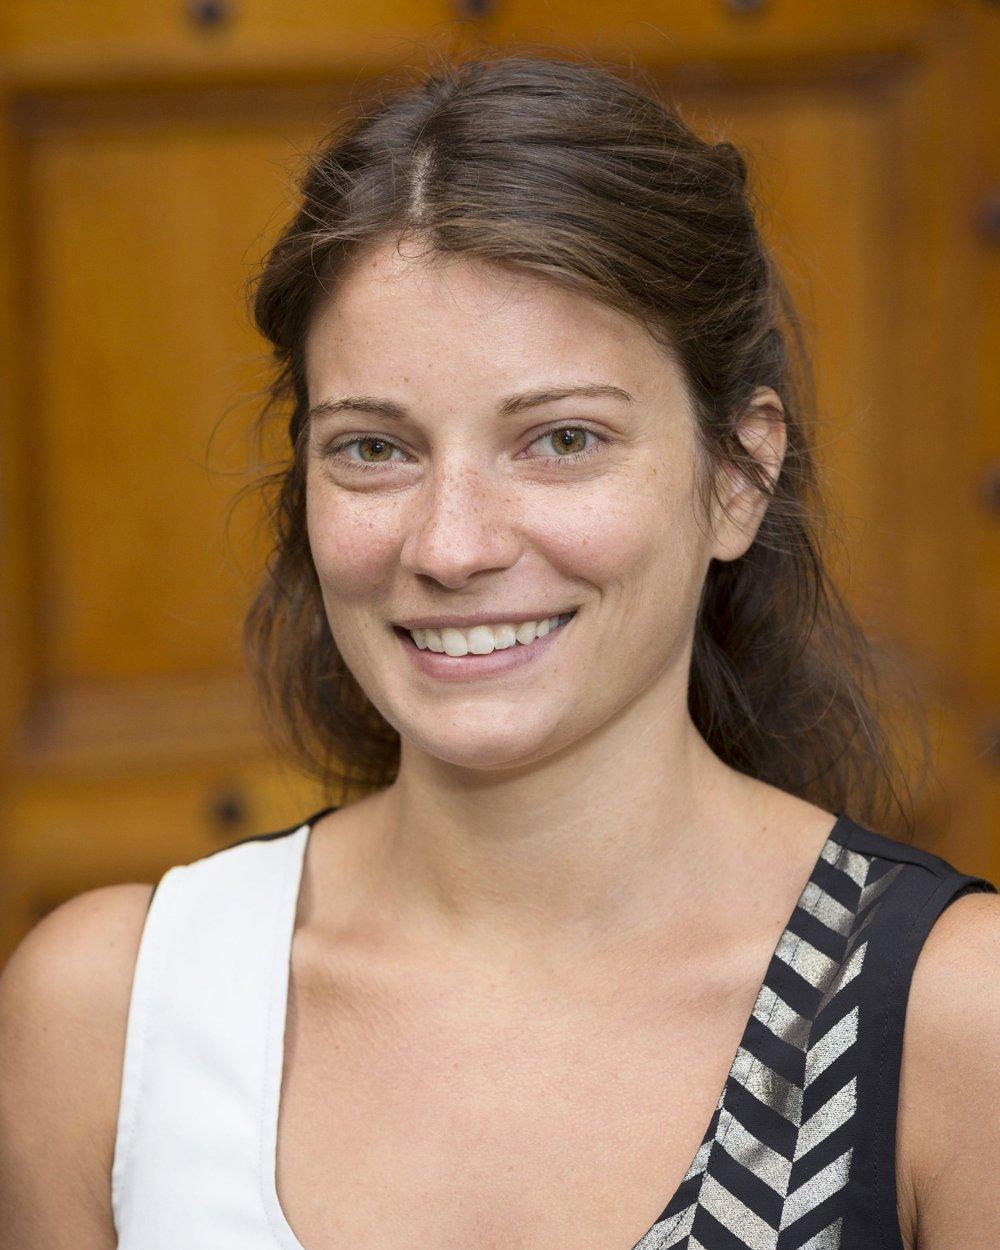 Danielle Norcini    PhD candidate in physics   Yale Physics Professional Development Organization representative, registration coordinator